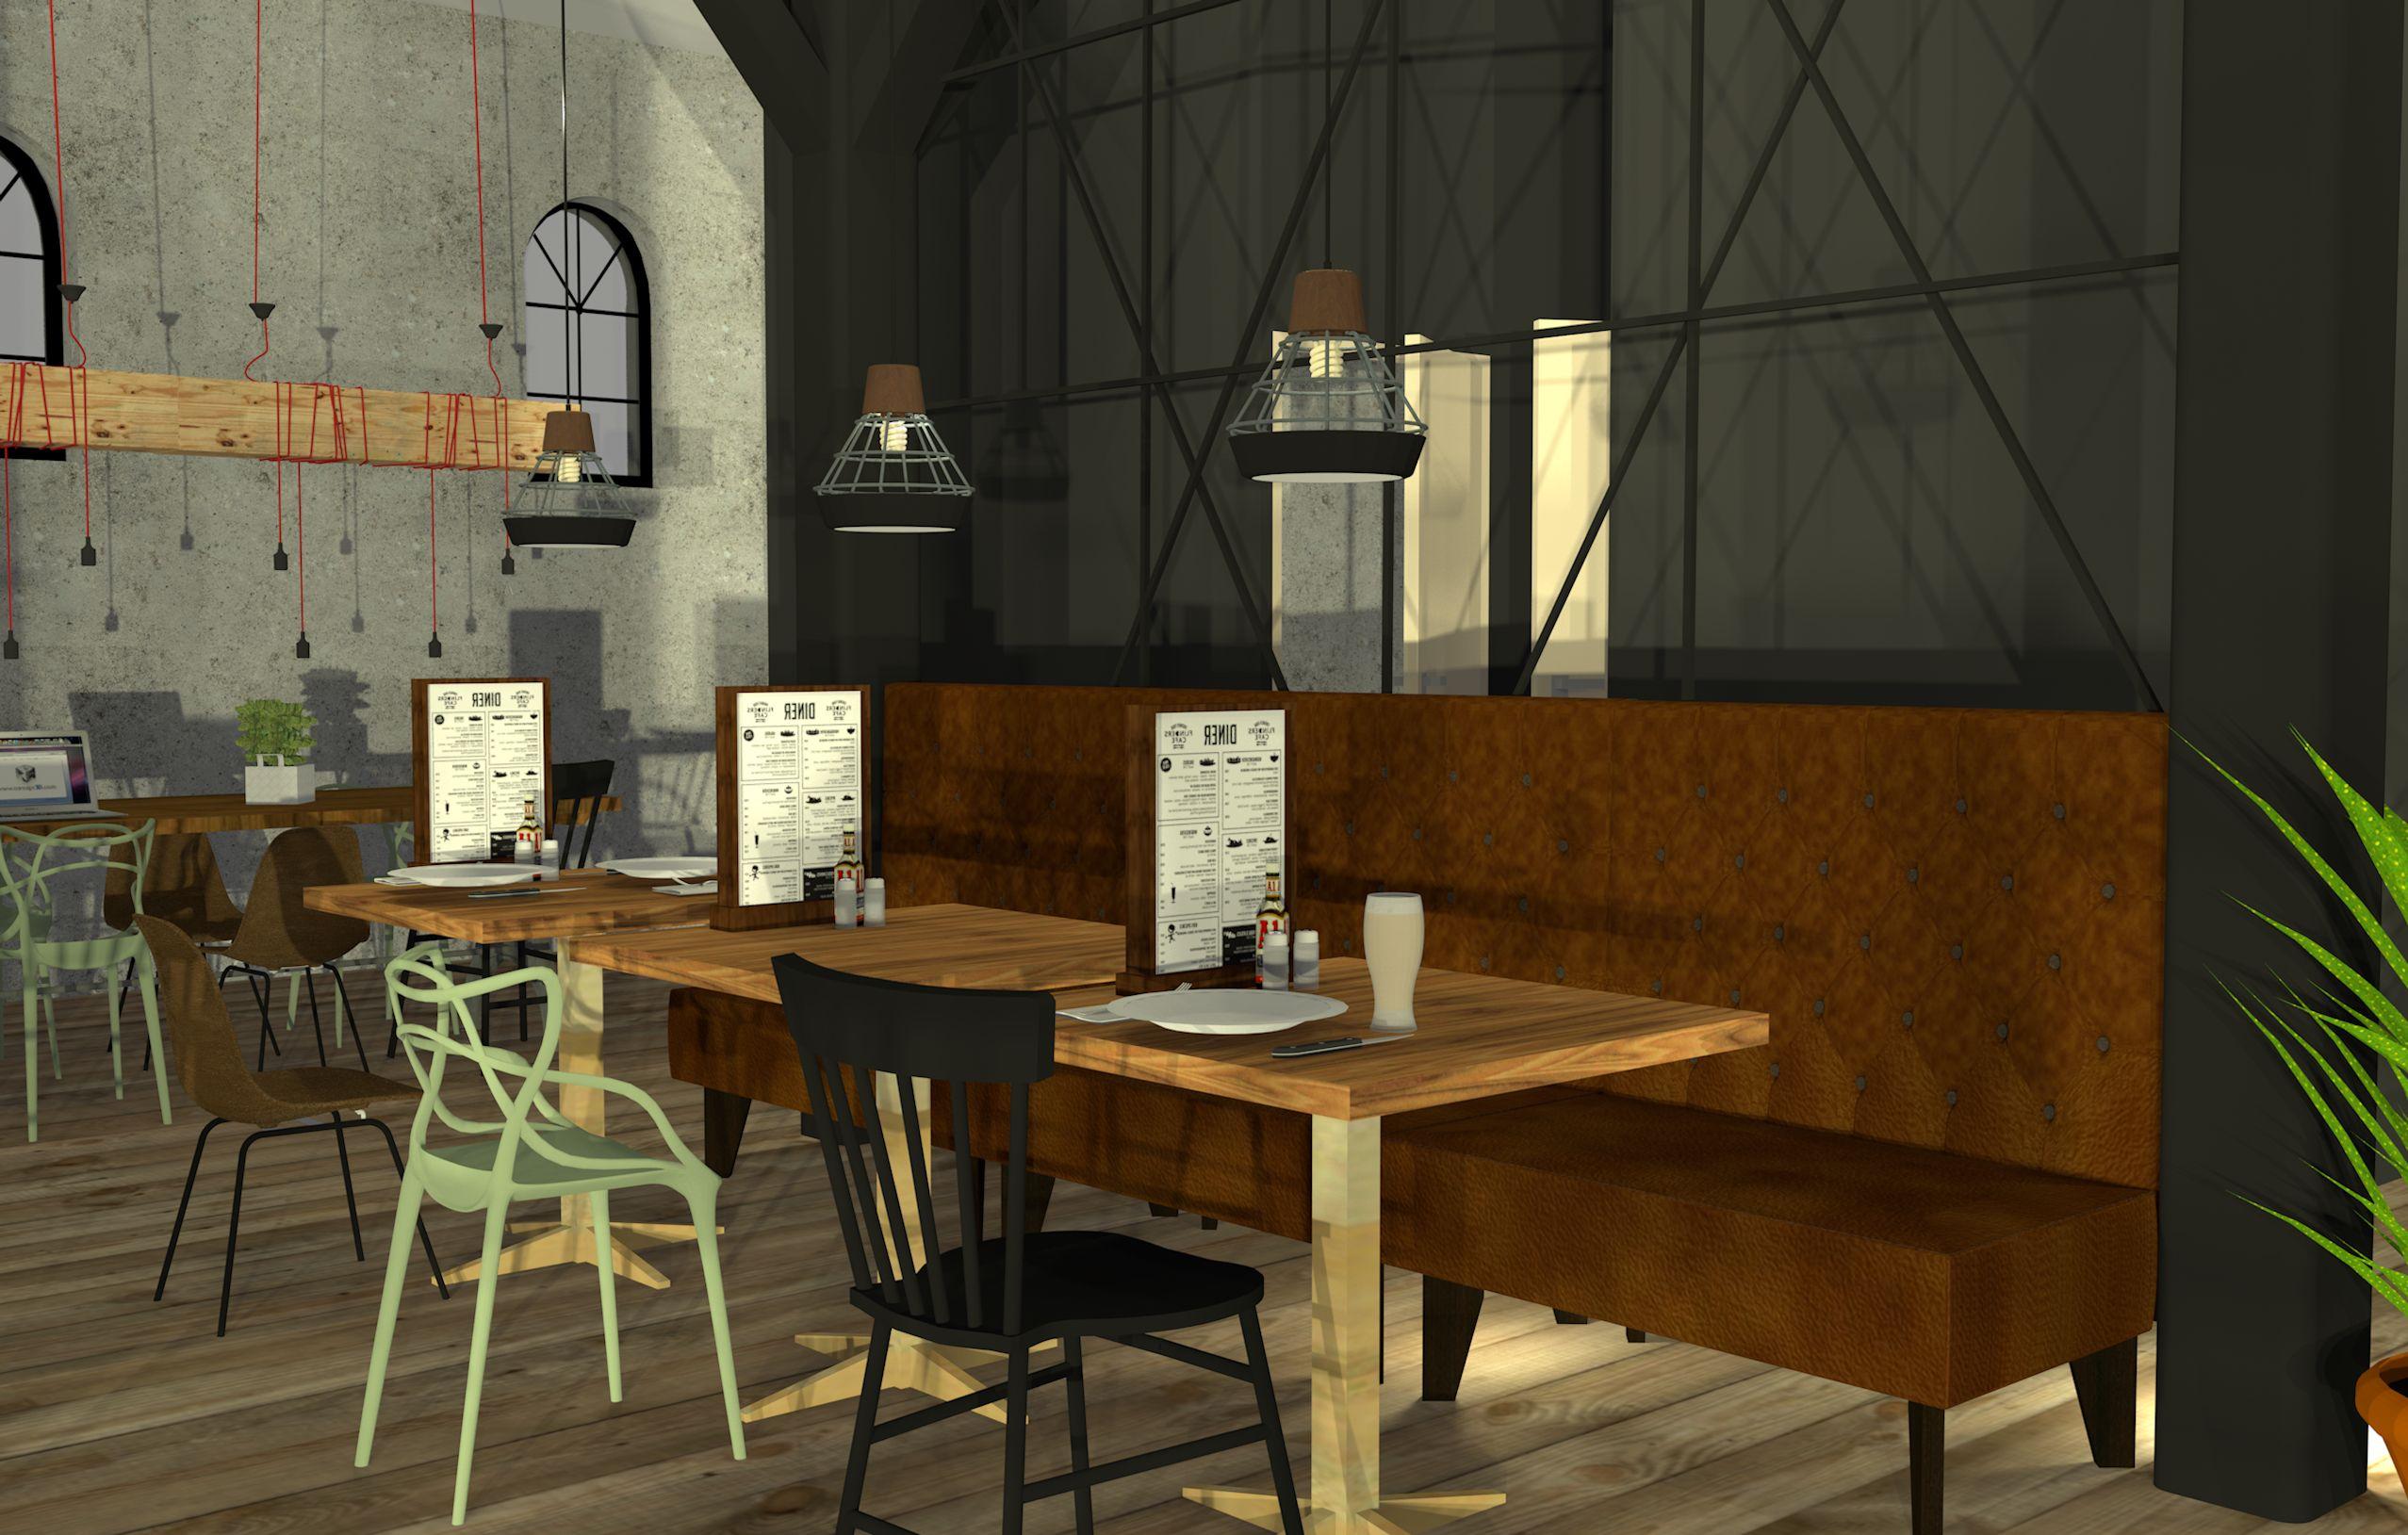 3d Interieur Inrichten : Interieuradvies interieur interior dtekening d rendering